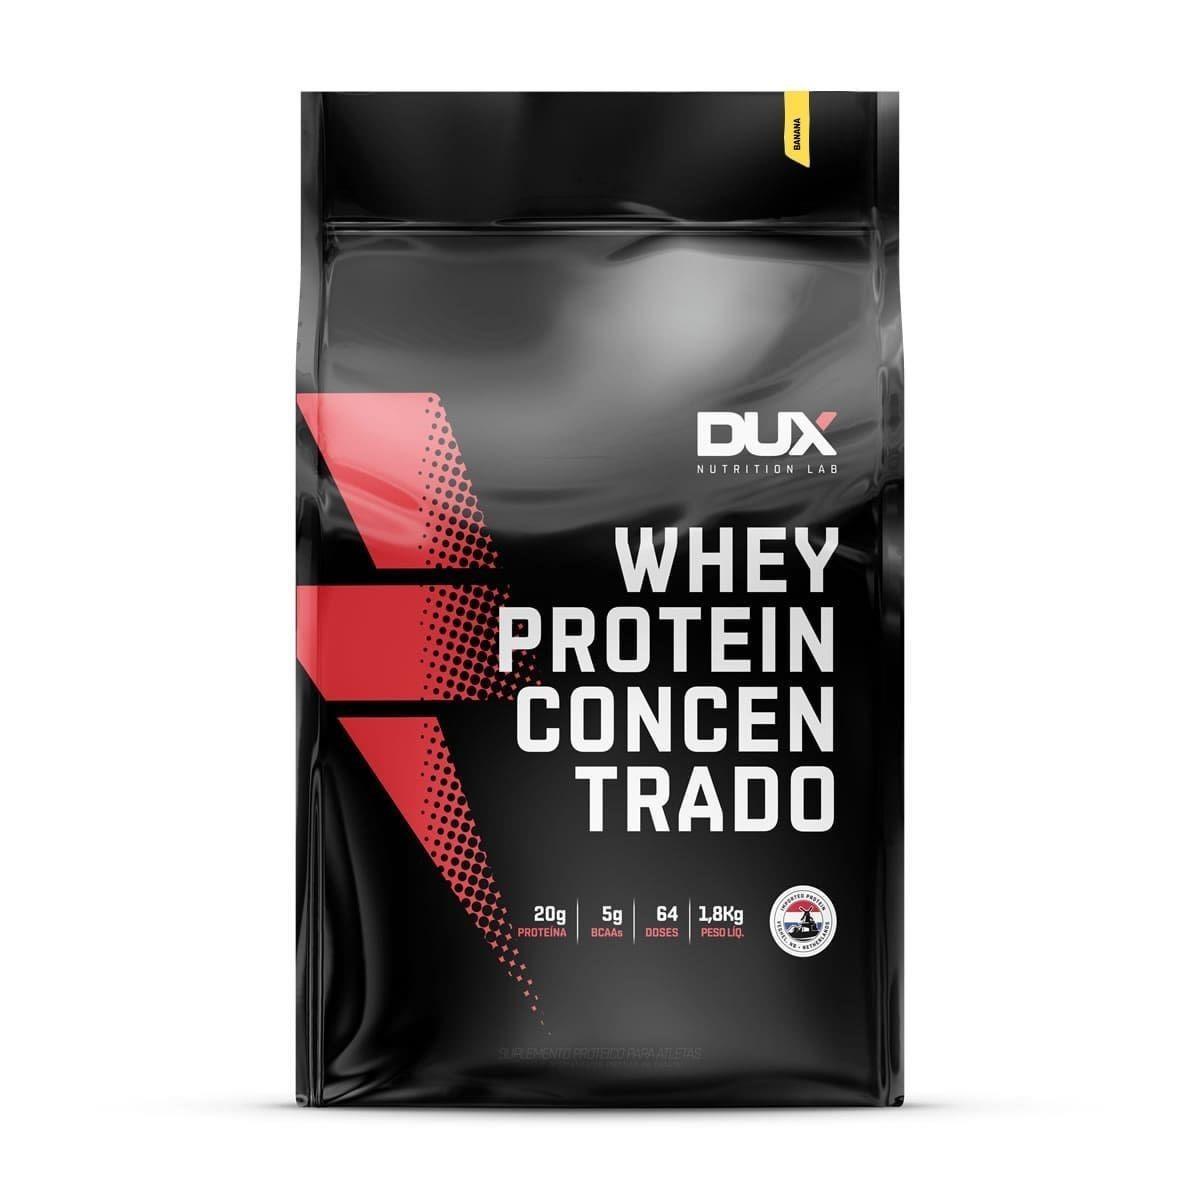 Whey Protein Concentrado Dux - 1,8Kg(Refil)